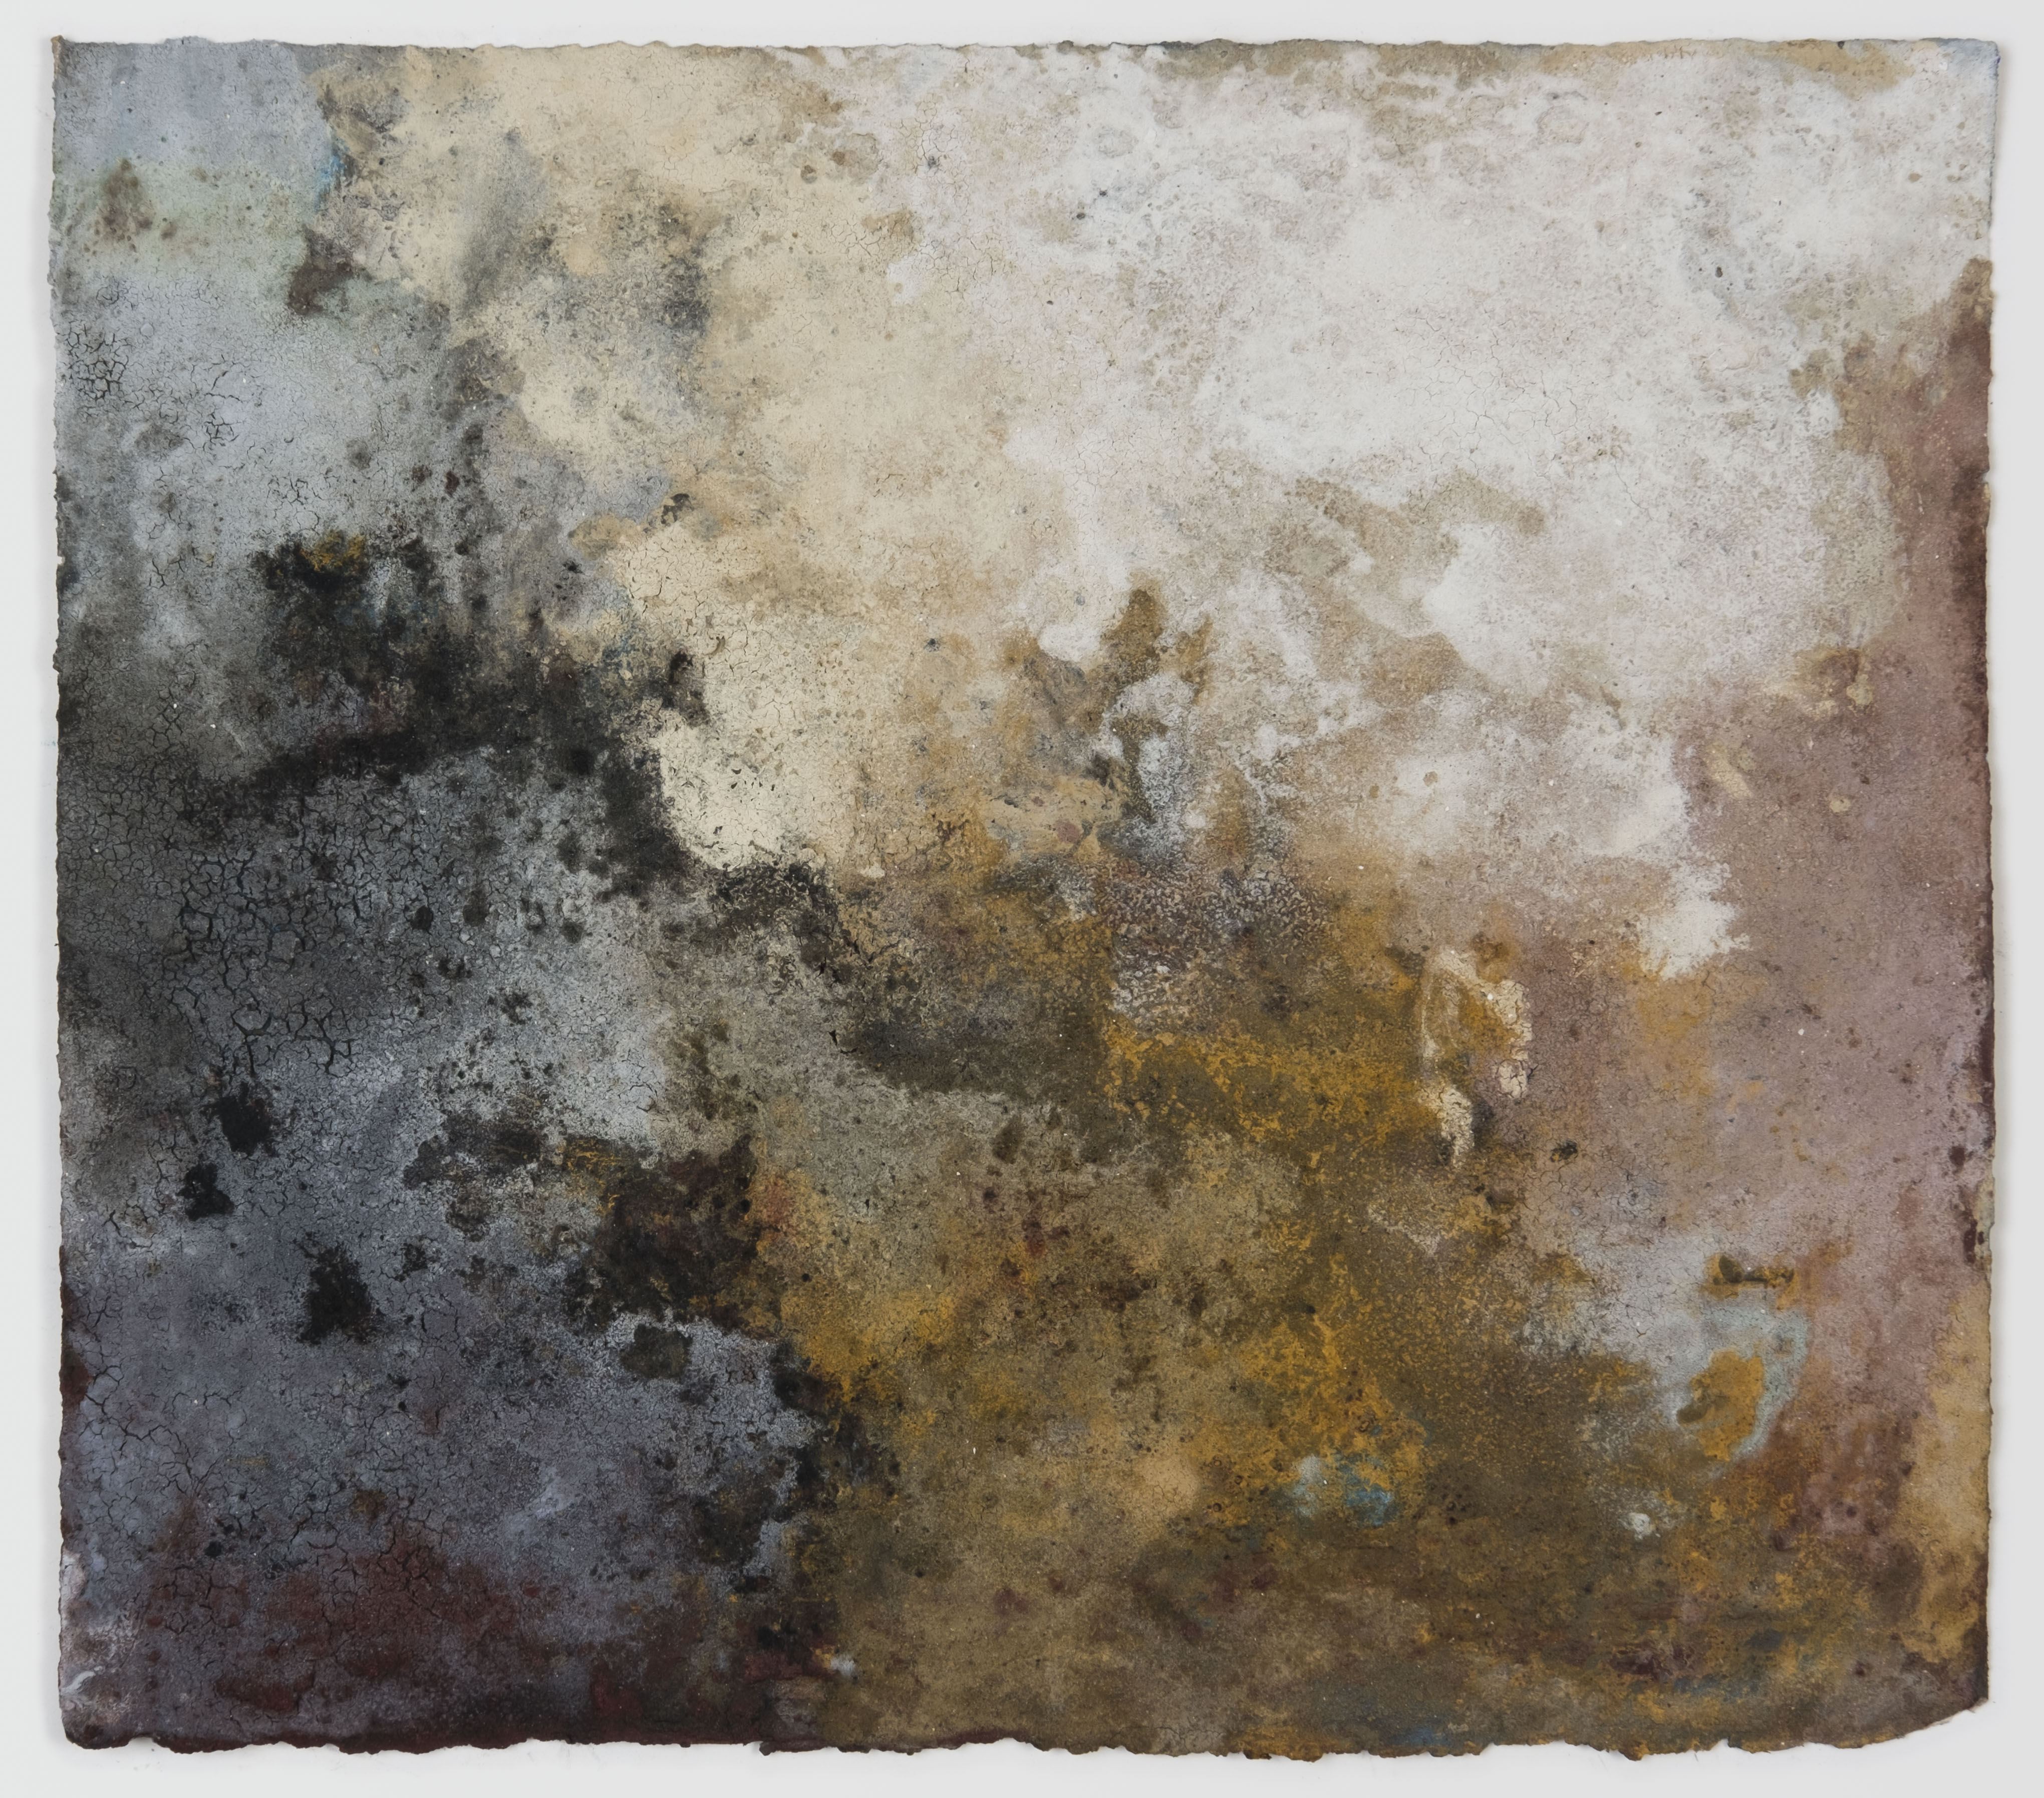 P.16 - 10, 2016